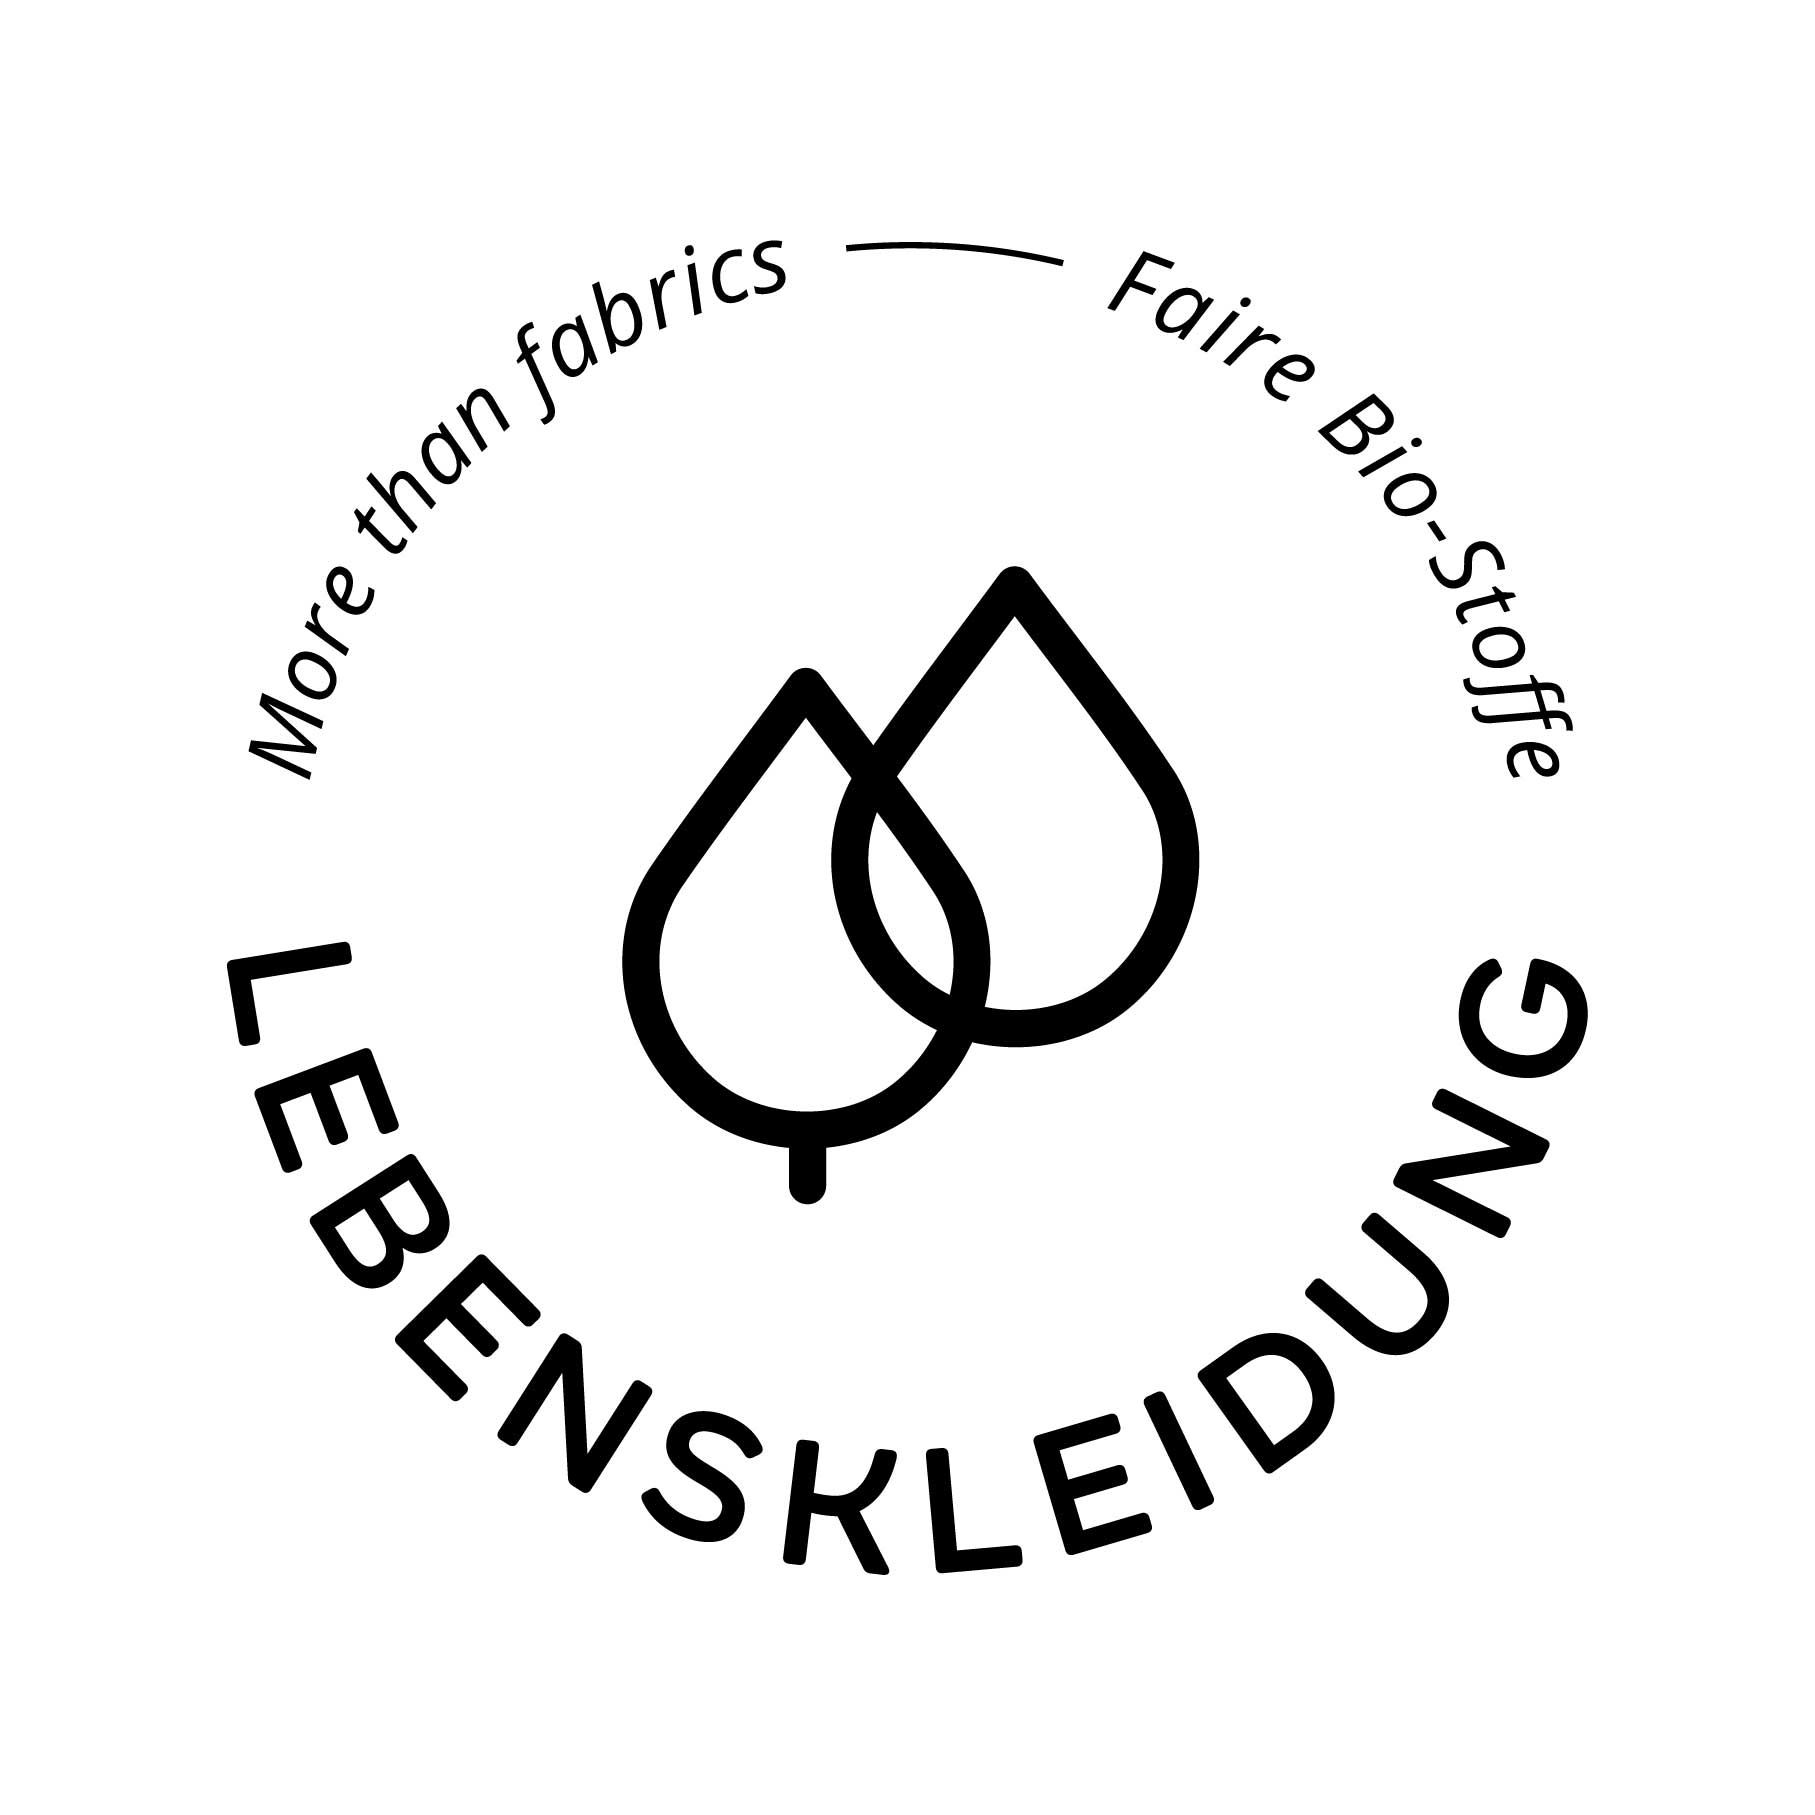 Bio Tissu RIB 2x1 (manchette) - Blanc